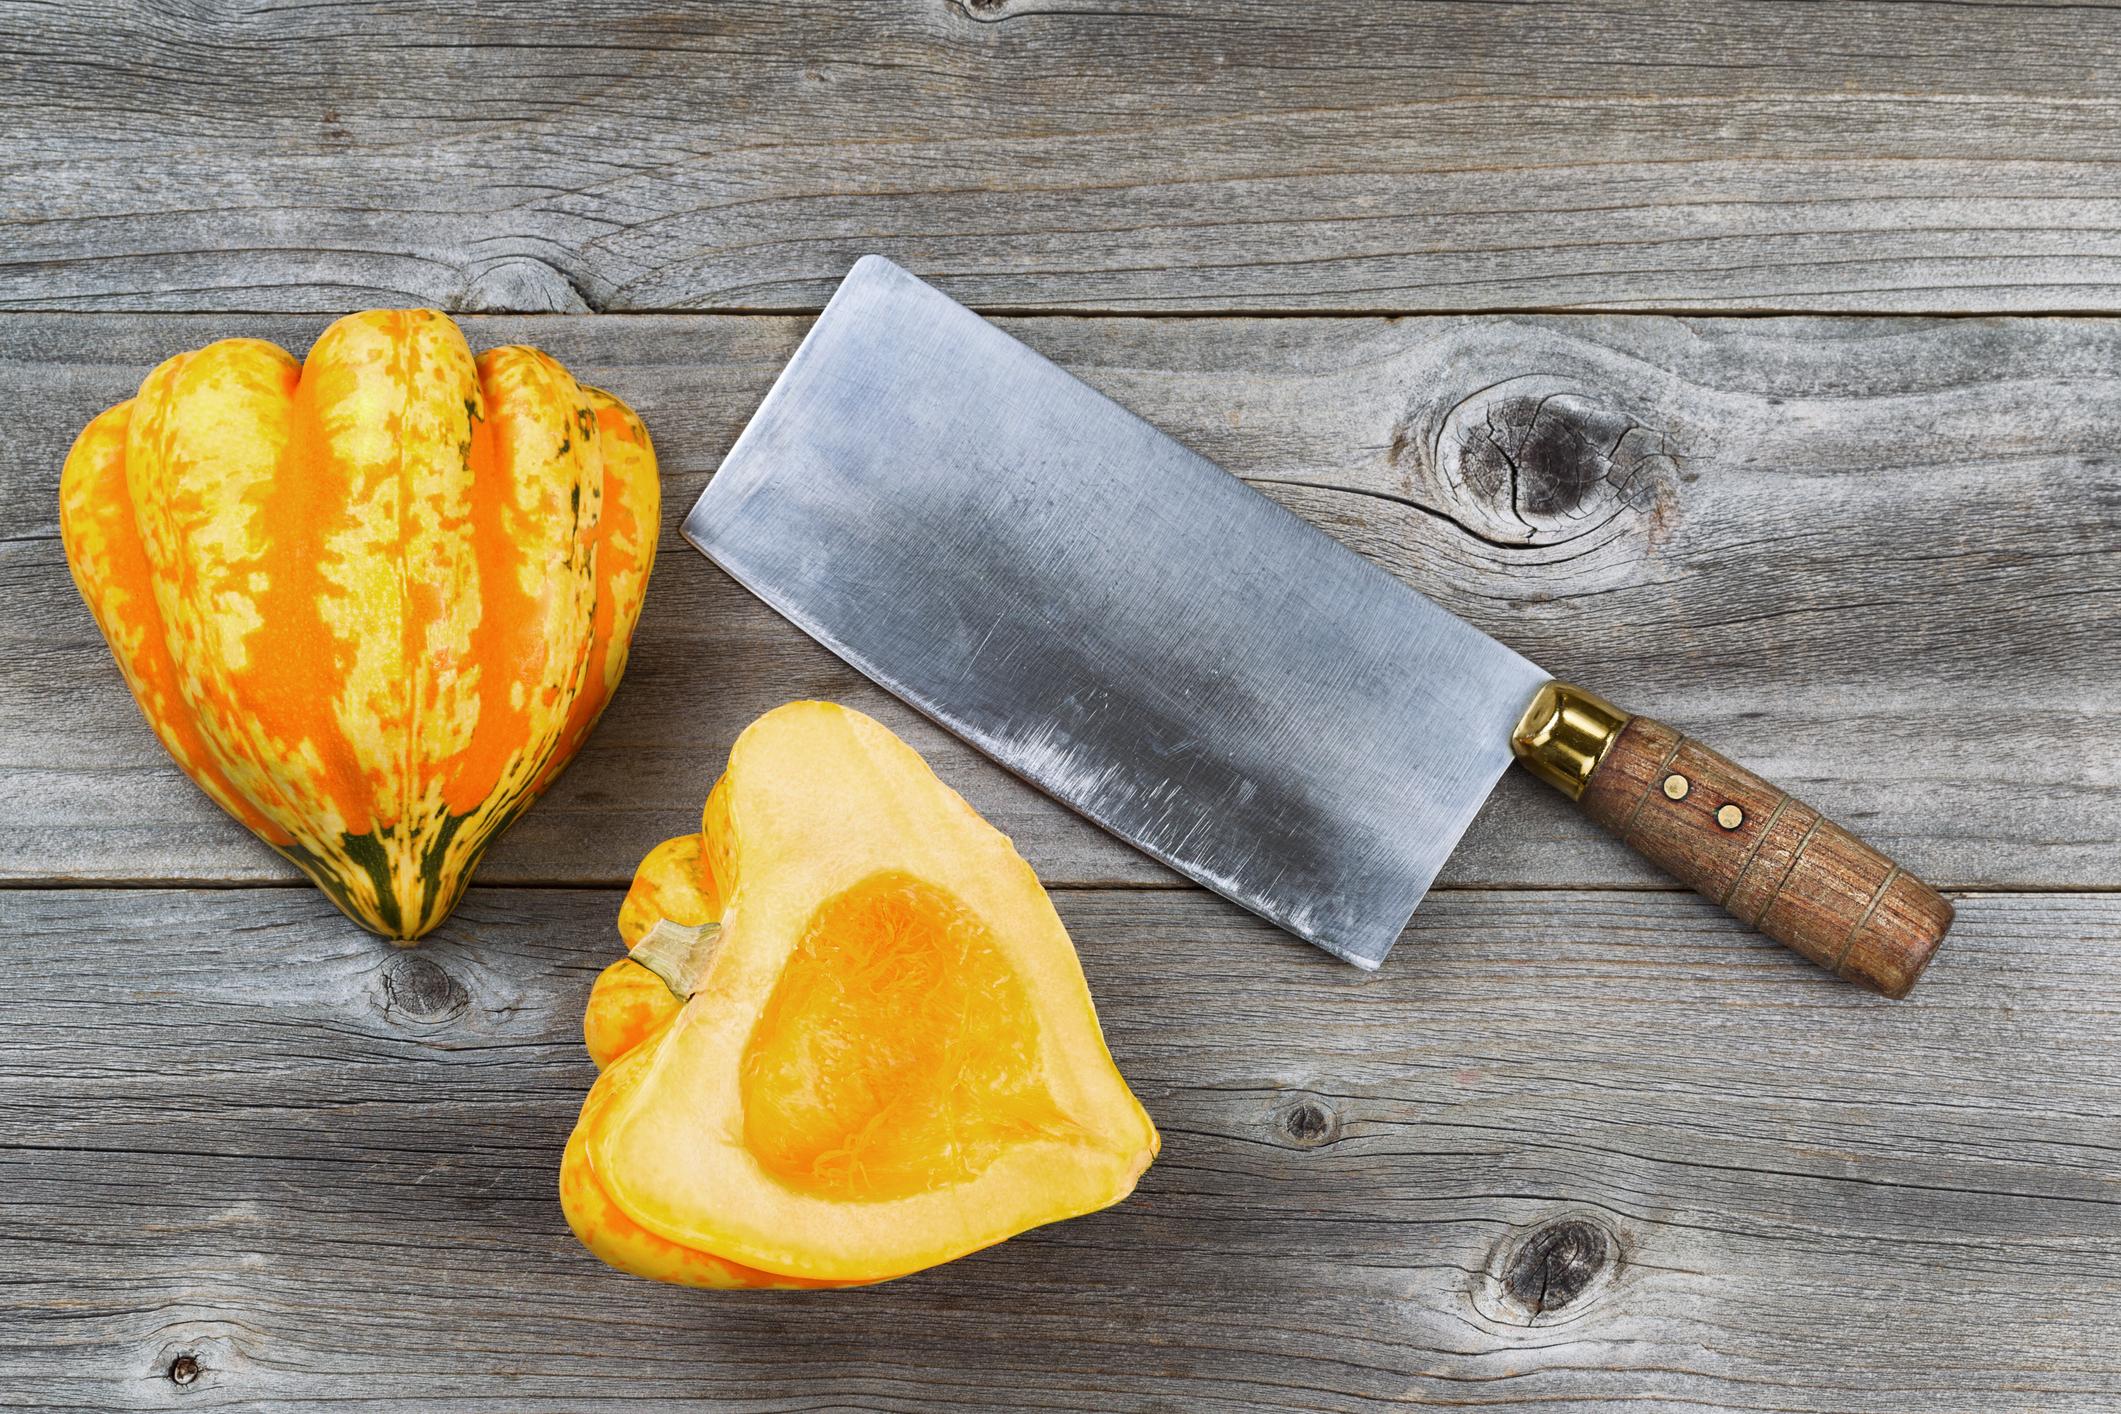 © Tab1962   Dreamstime.com - Freshly Cut Squash With Large Knife On Rustic Wood Photo